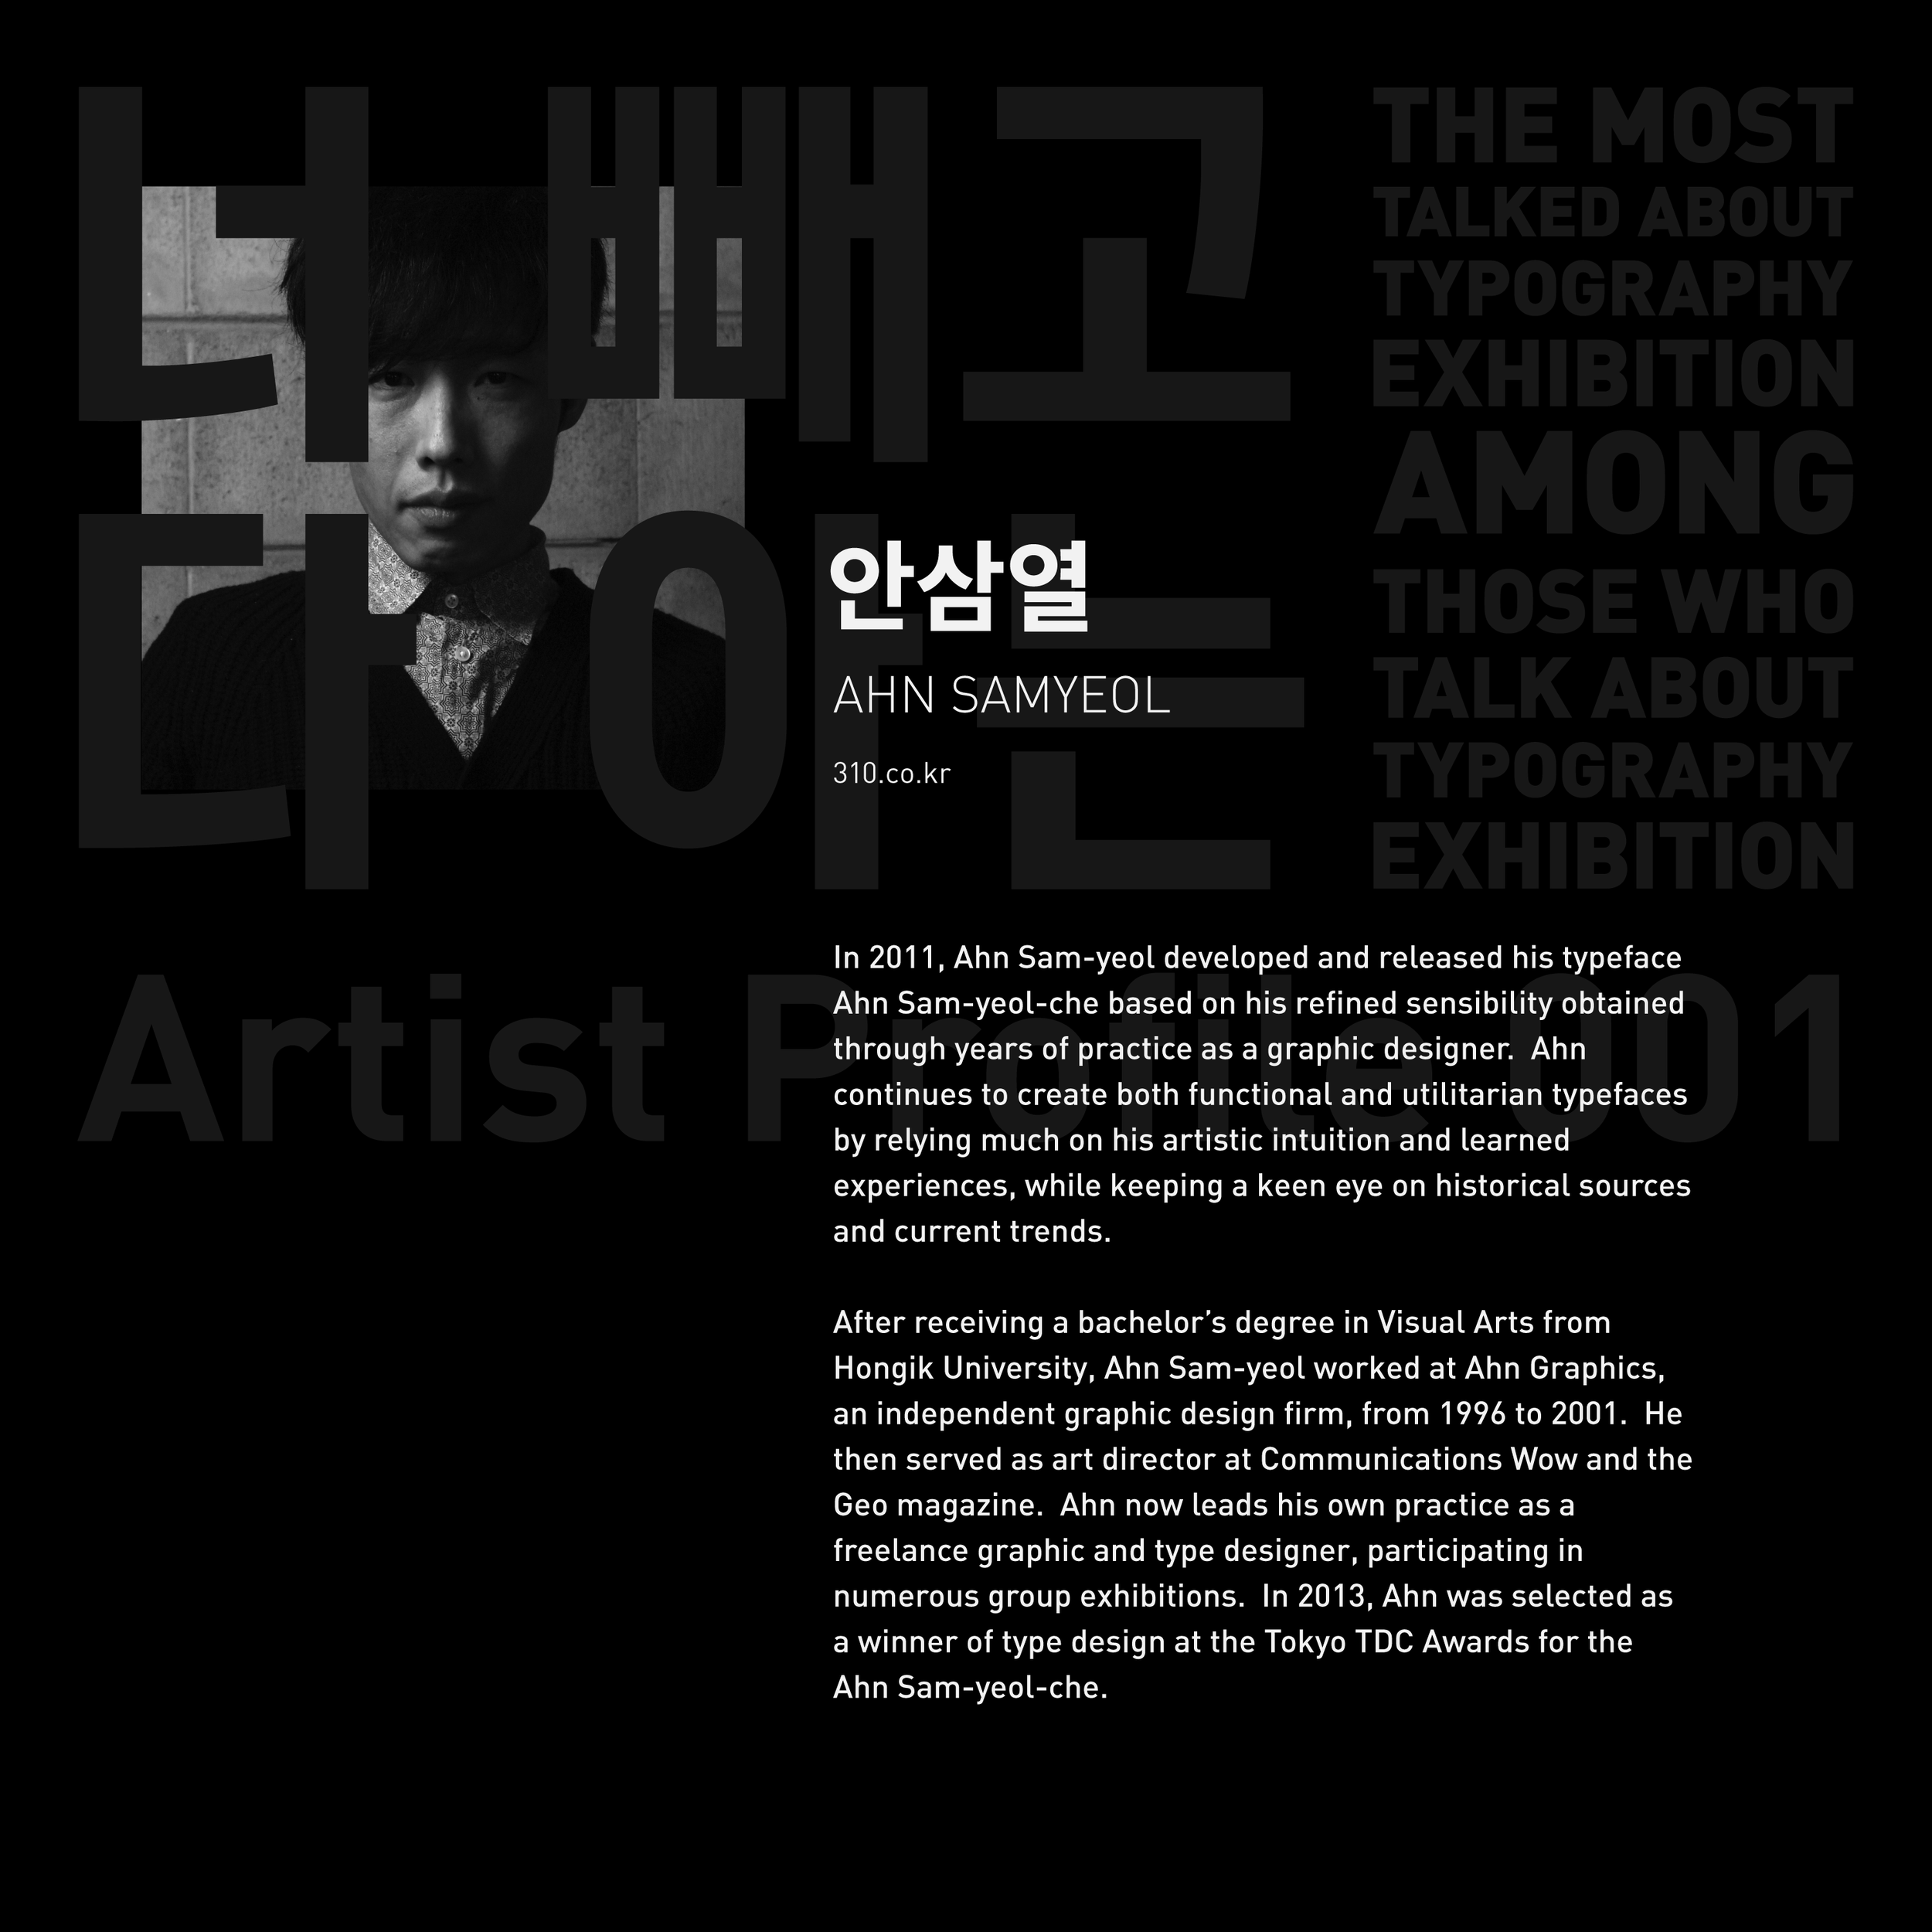 KoreanTypeExhibit_ArtistProfile_V2-01.png